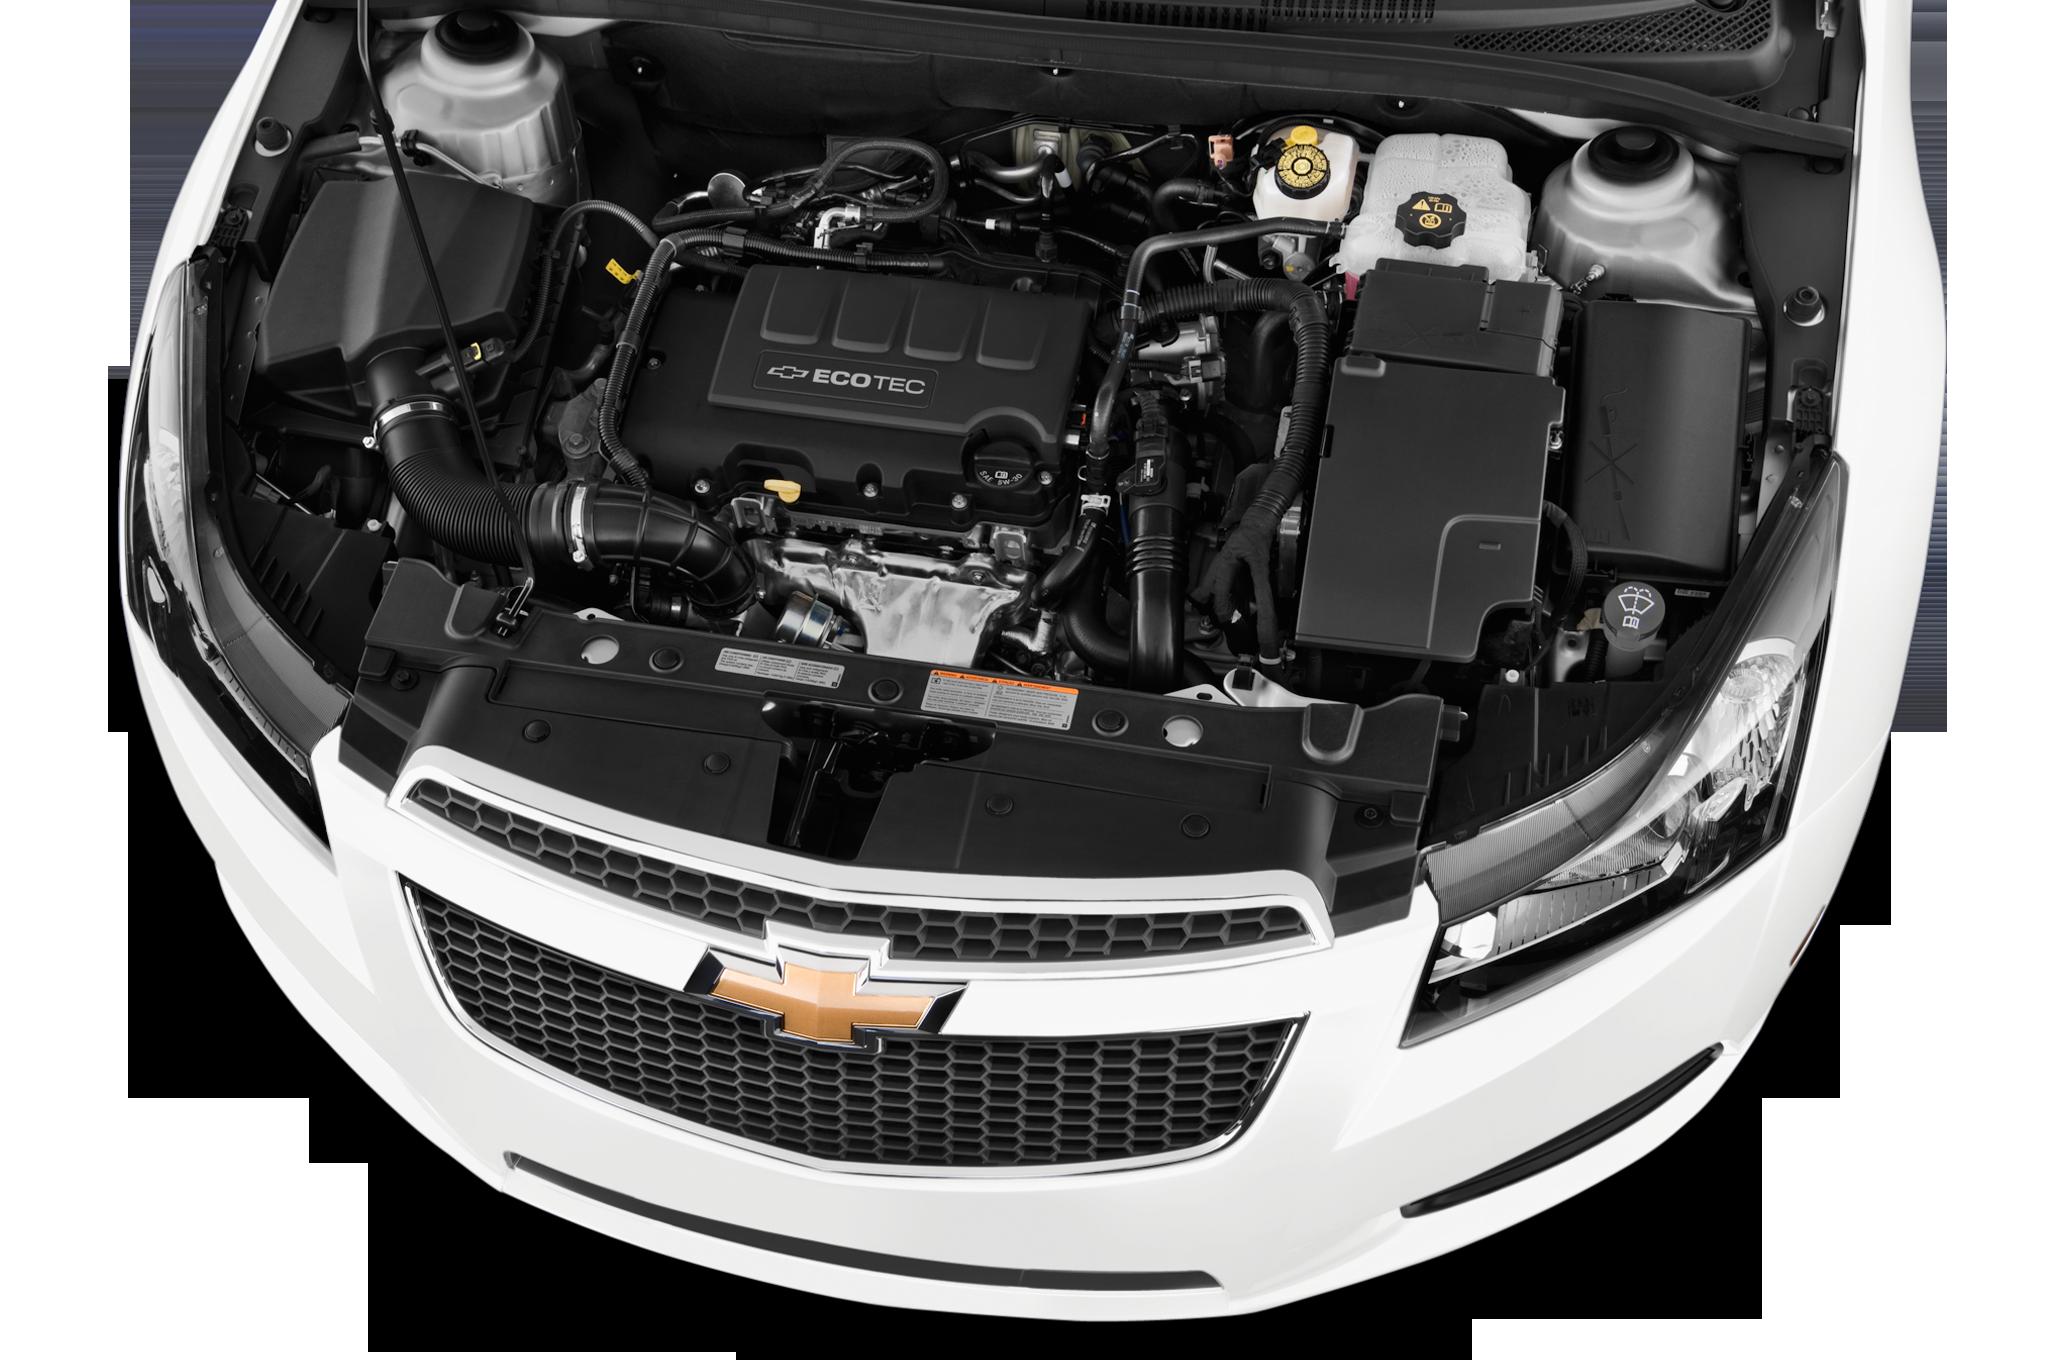 2019 Chevy Cruze Engine